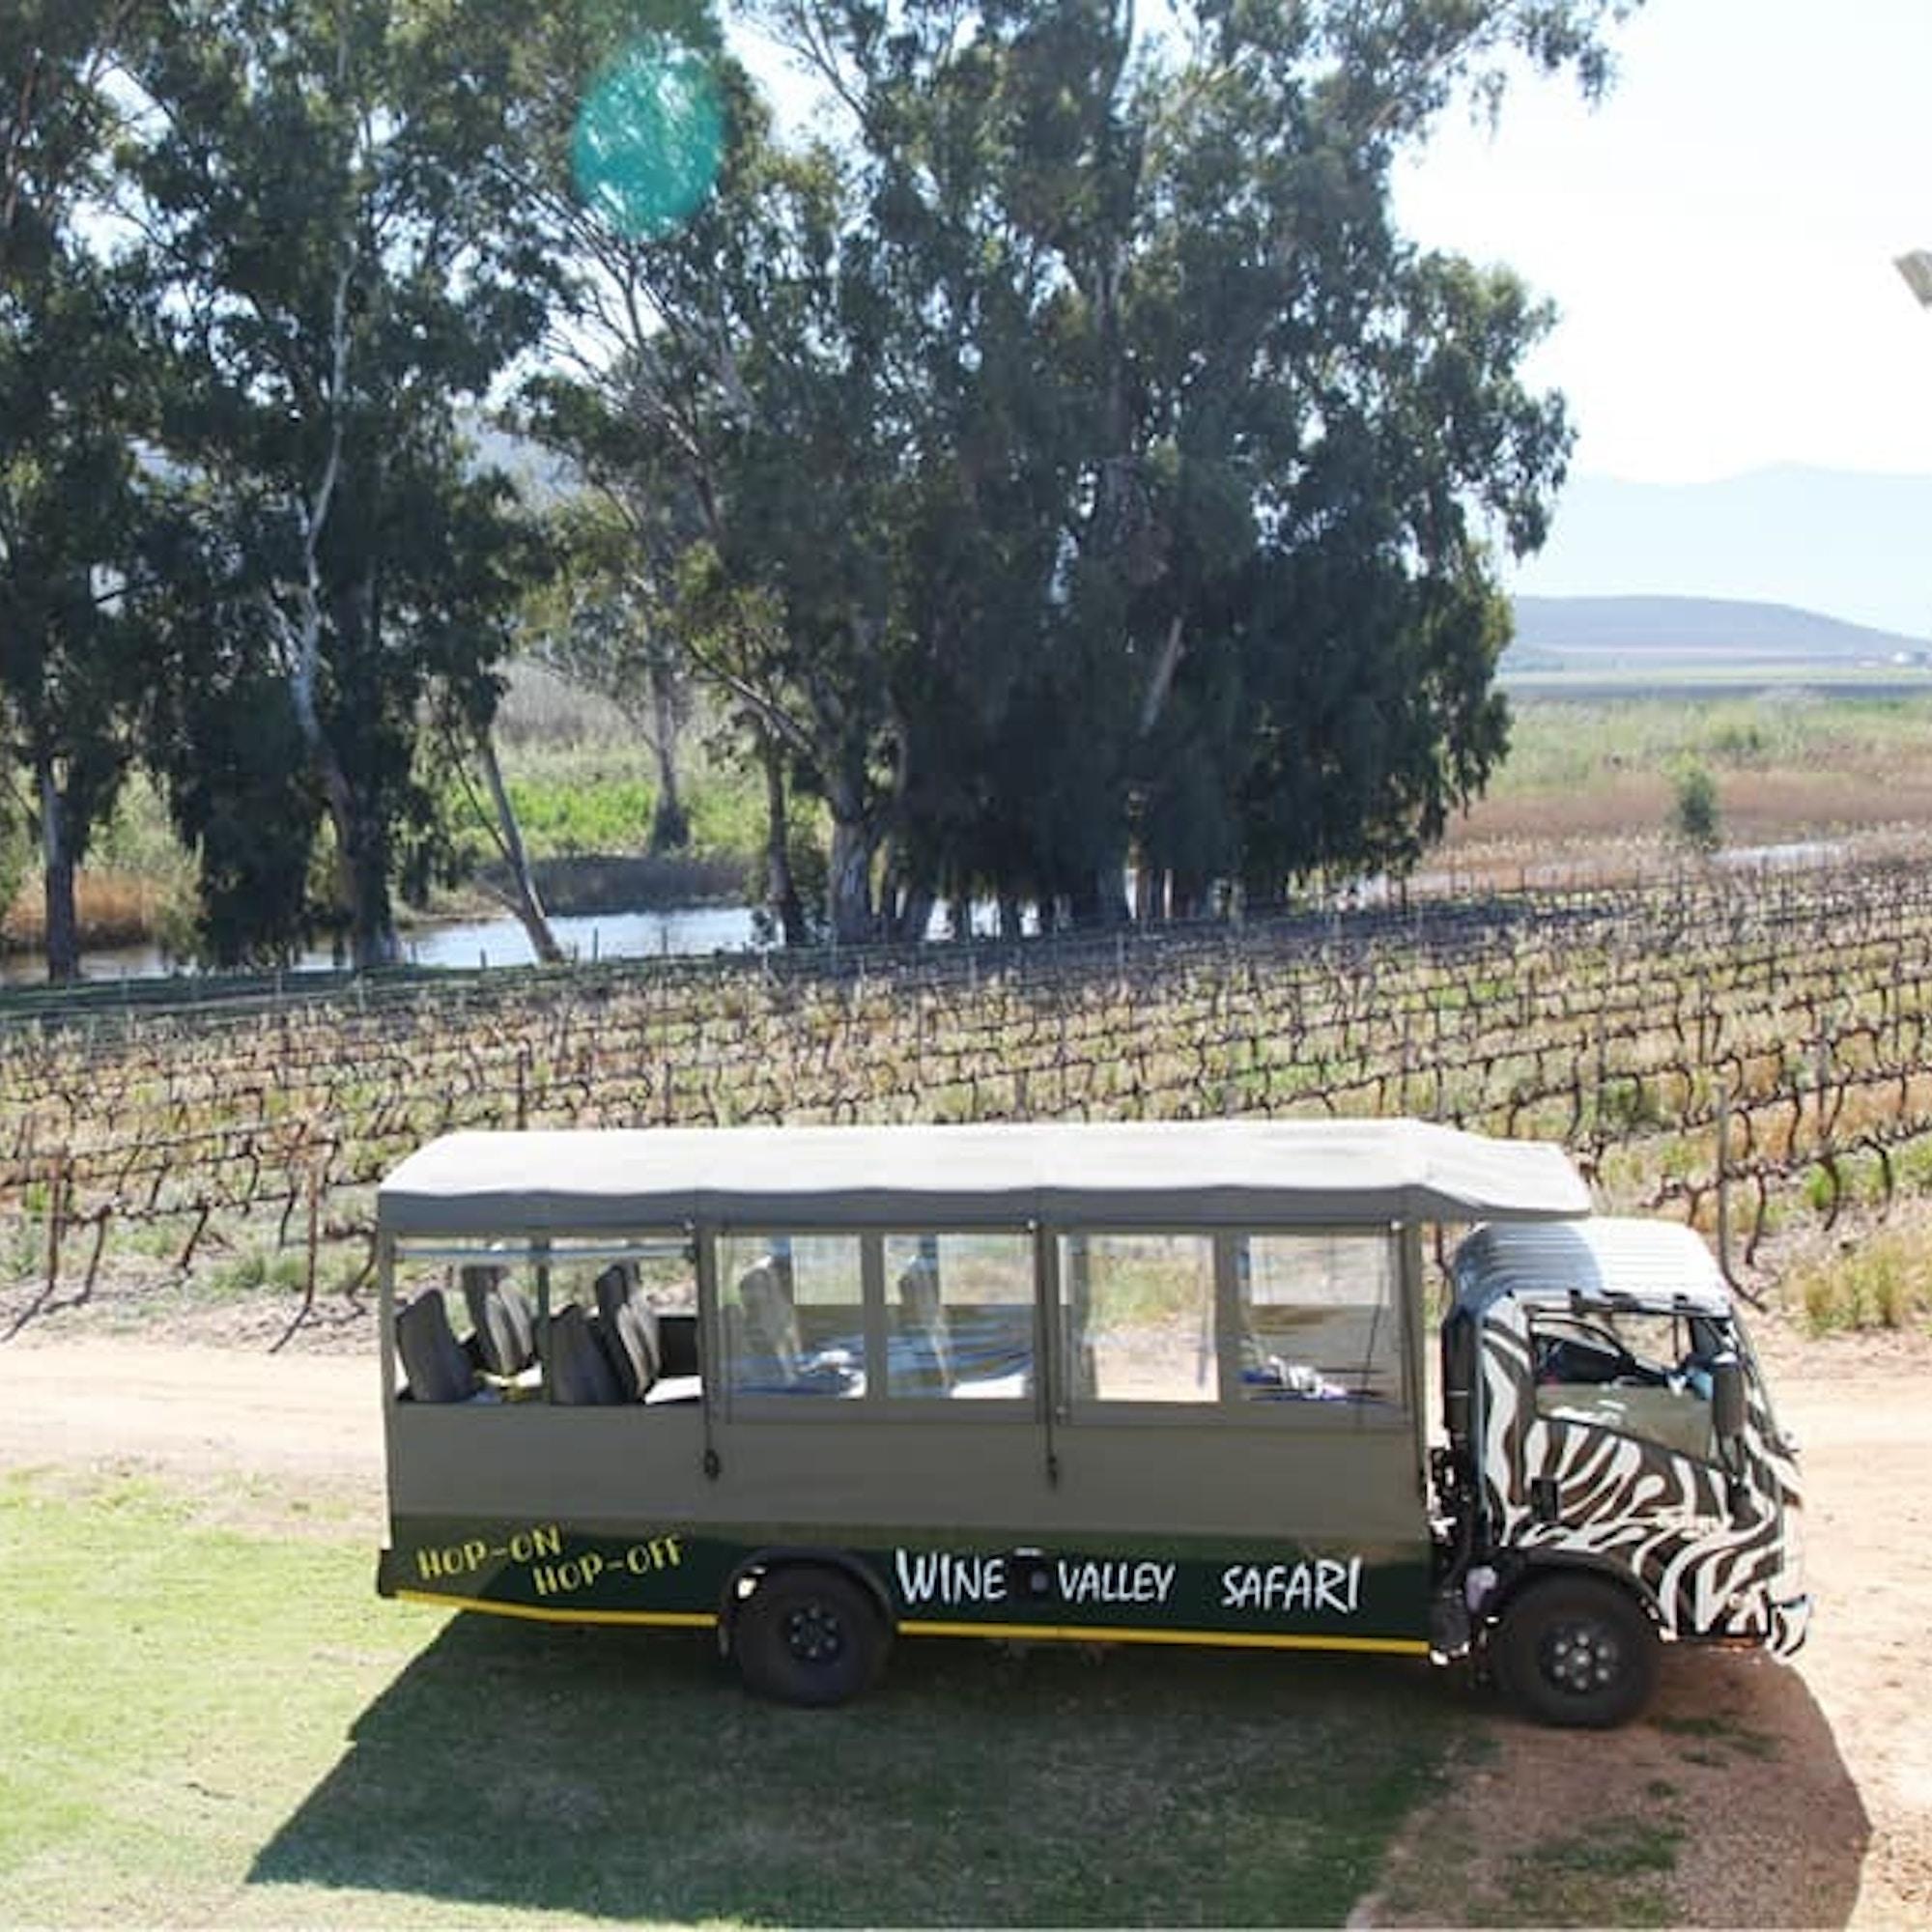 Wine Valley Safari